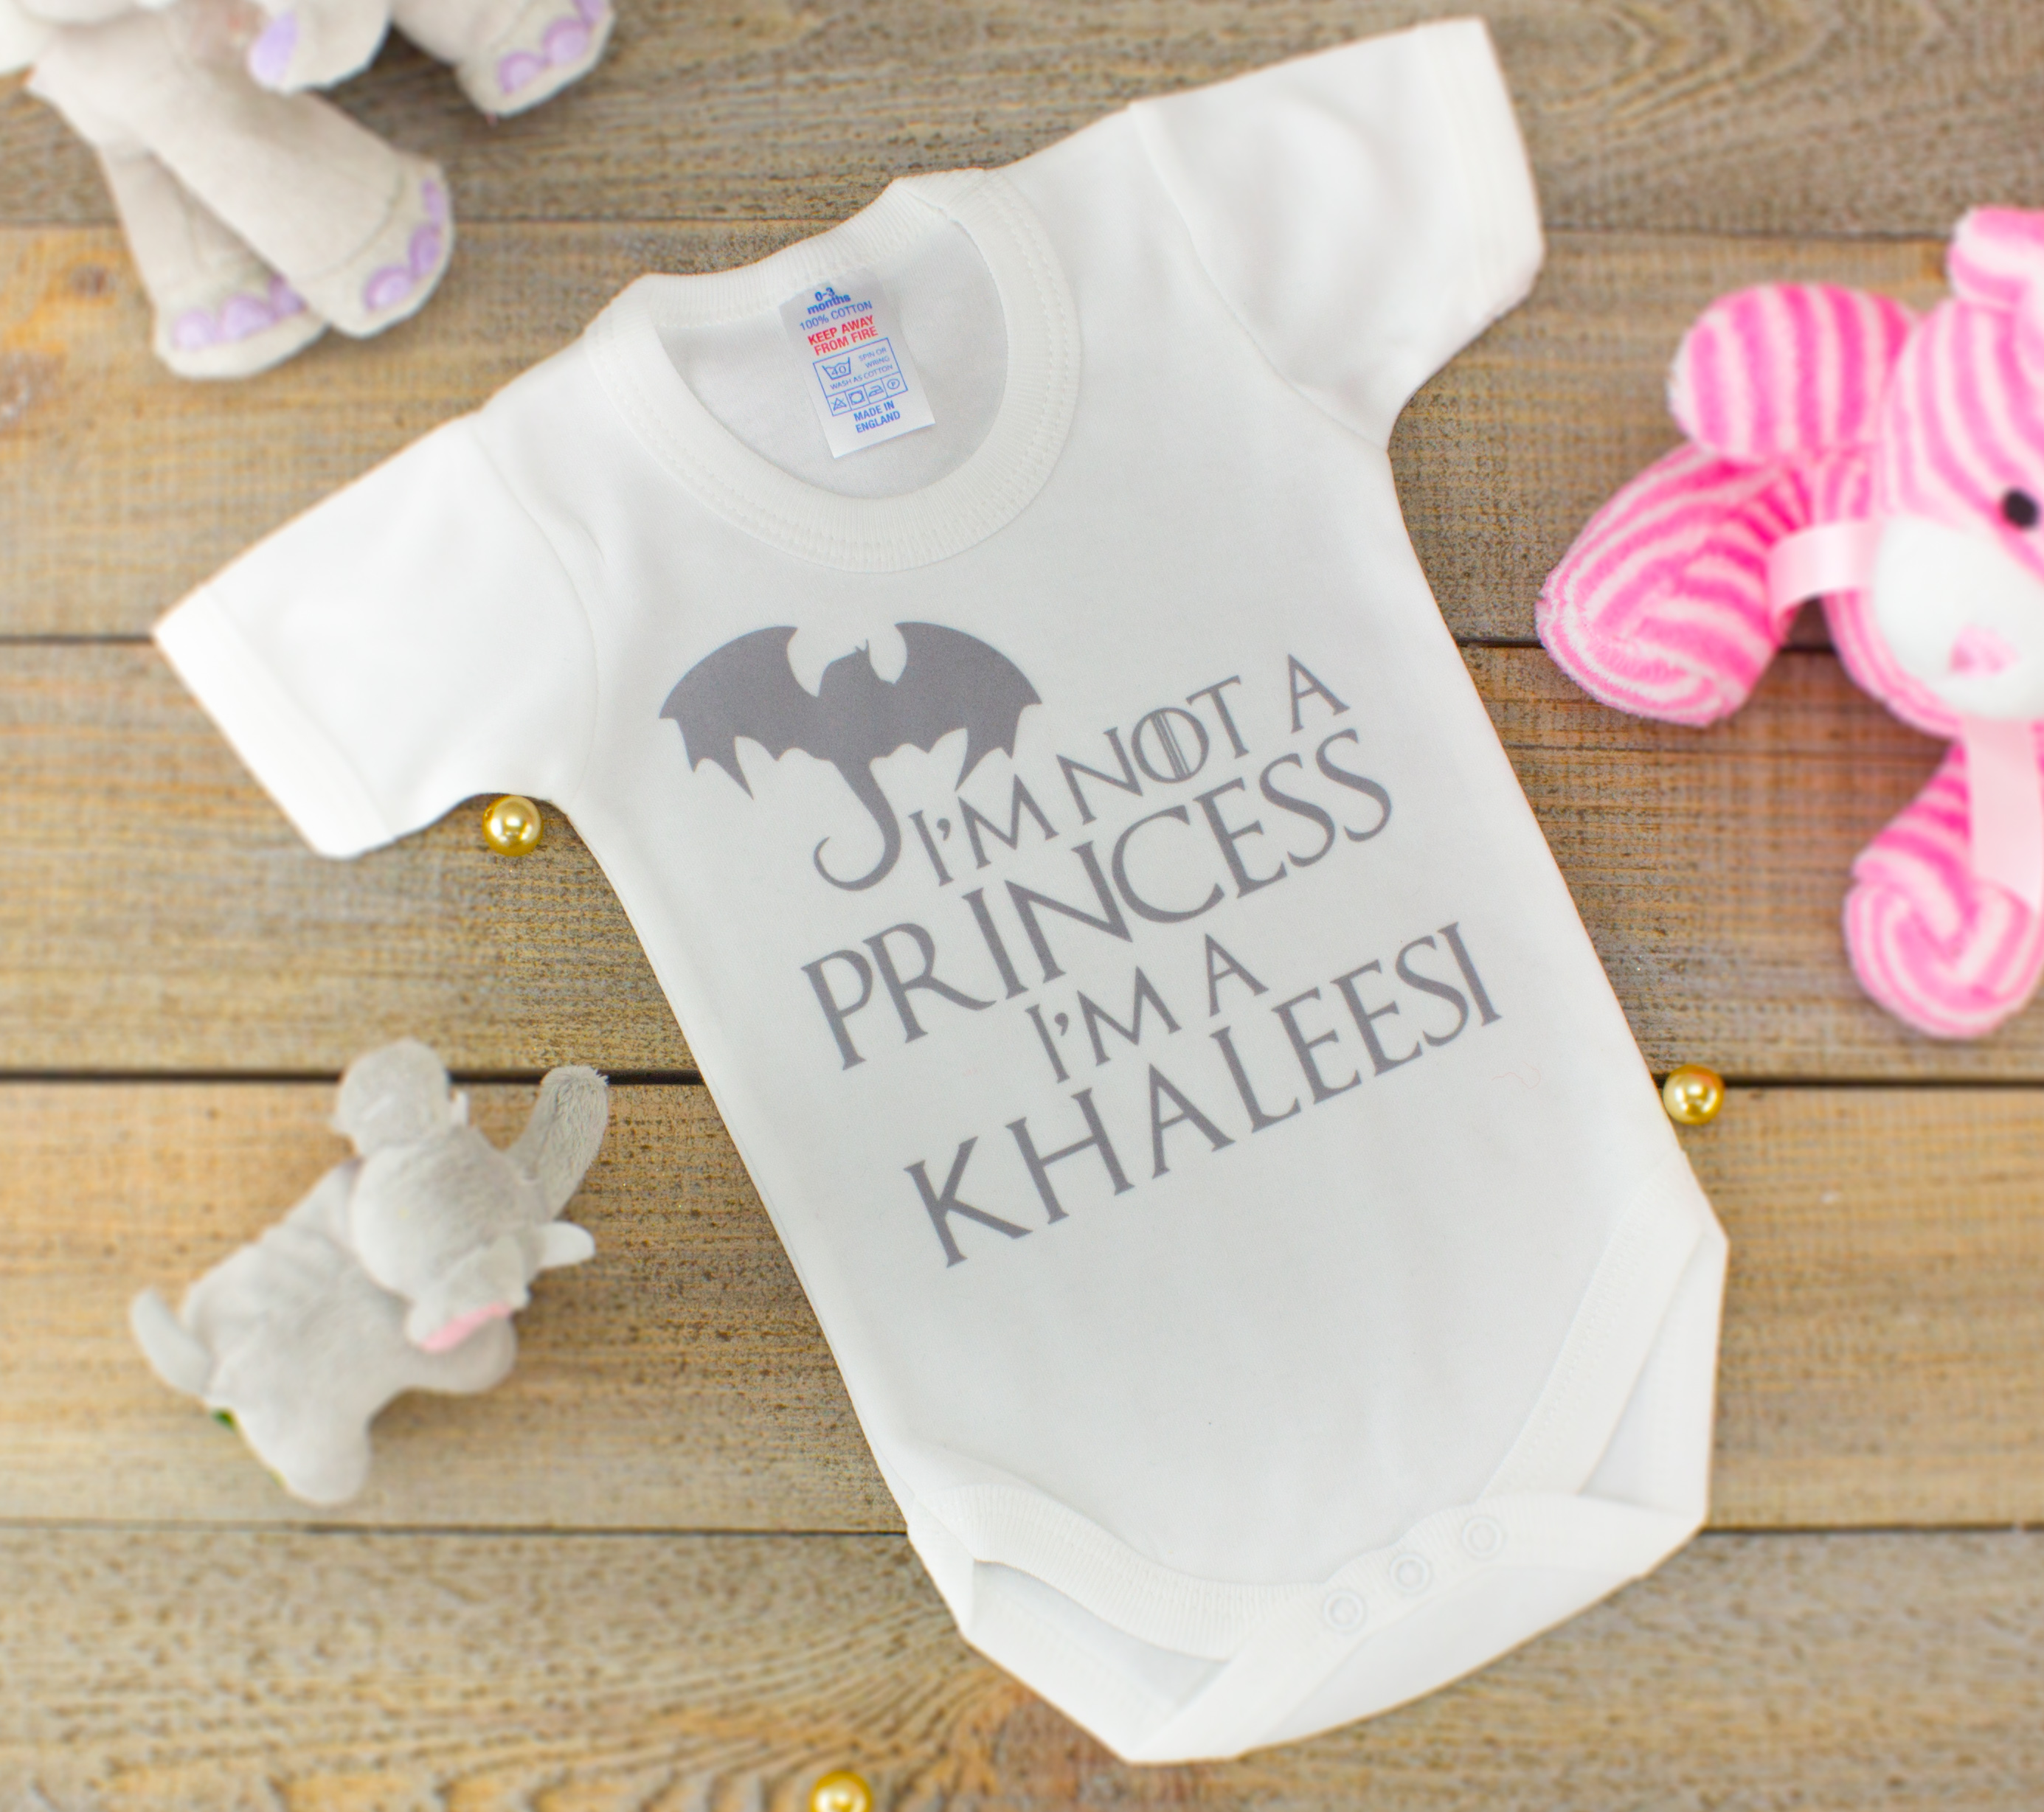 5644c0481f Game of Thrones Baby Bodysuit - I'm A Khalessi